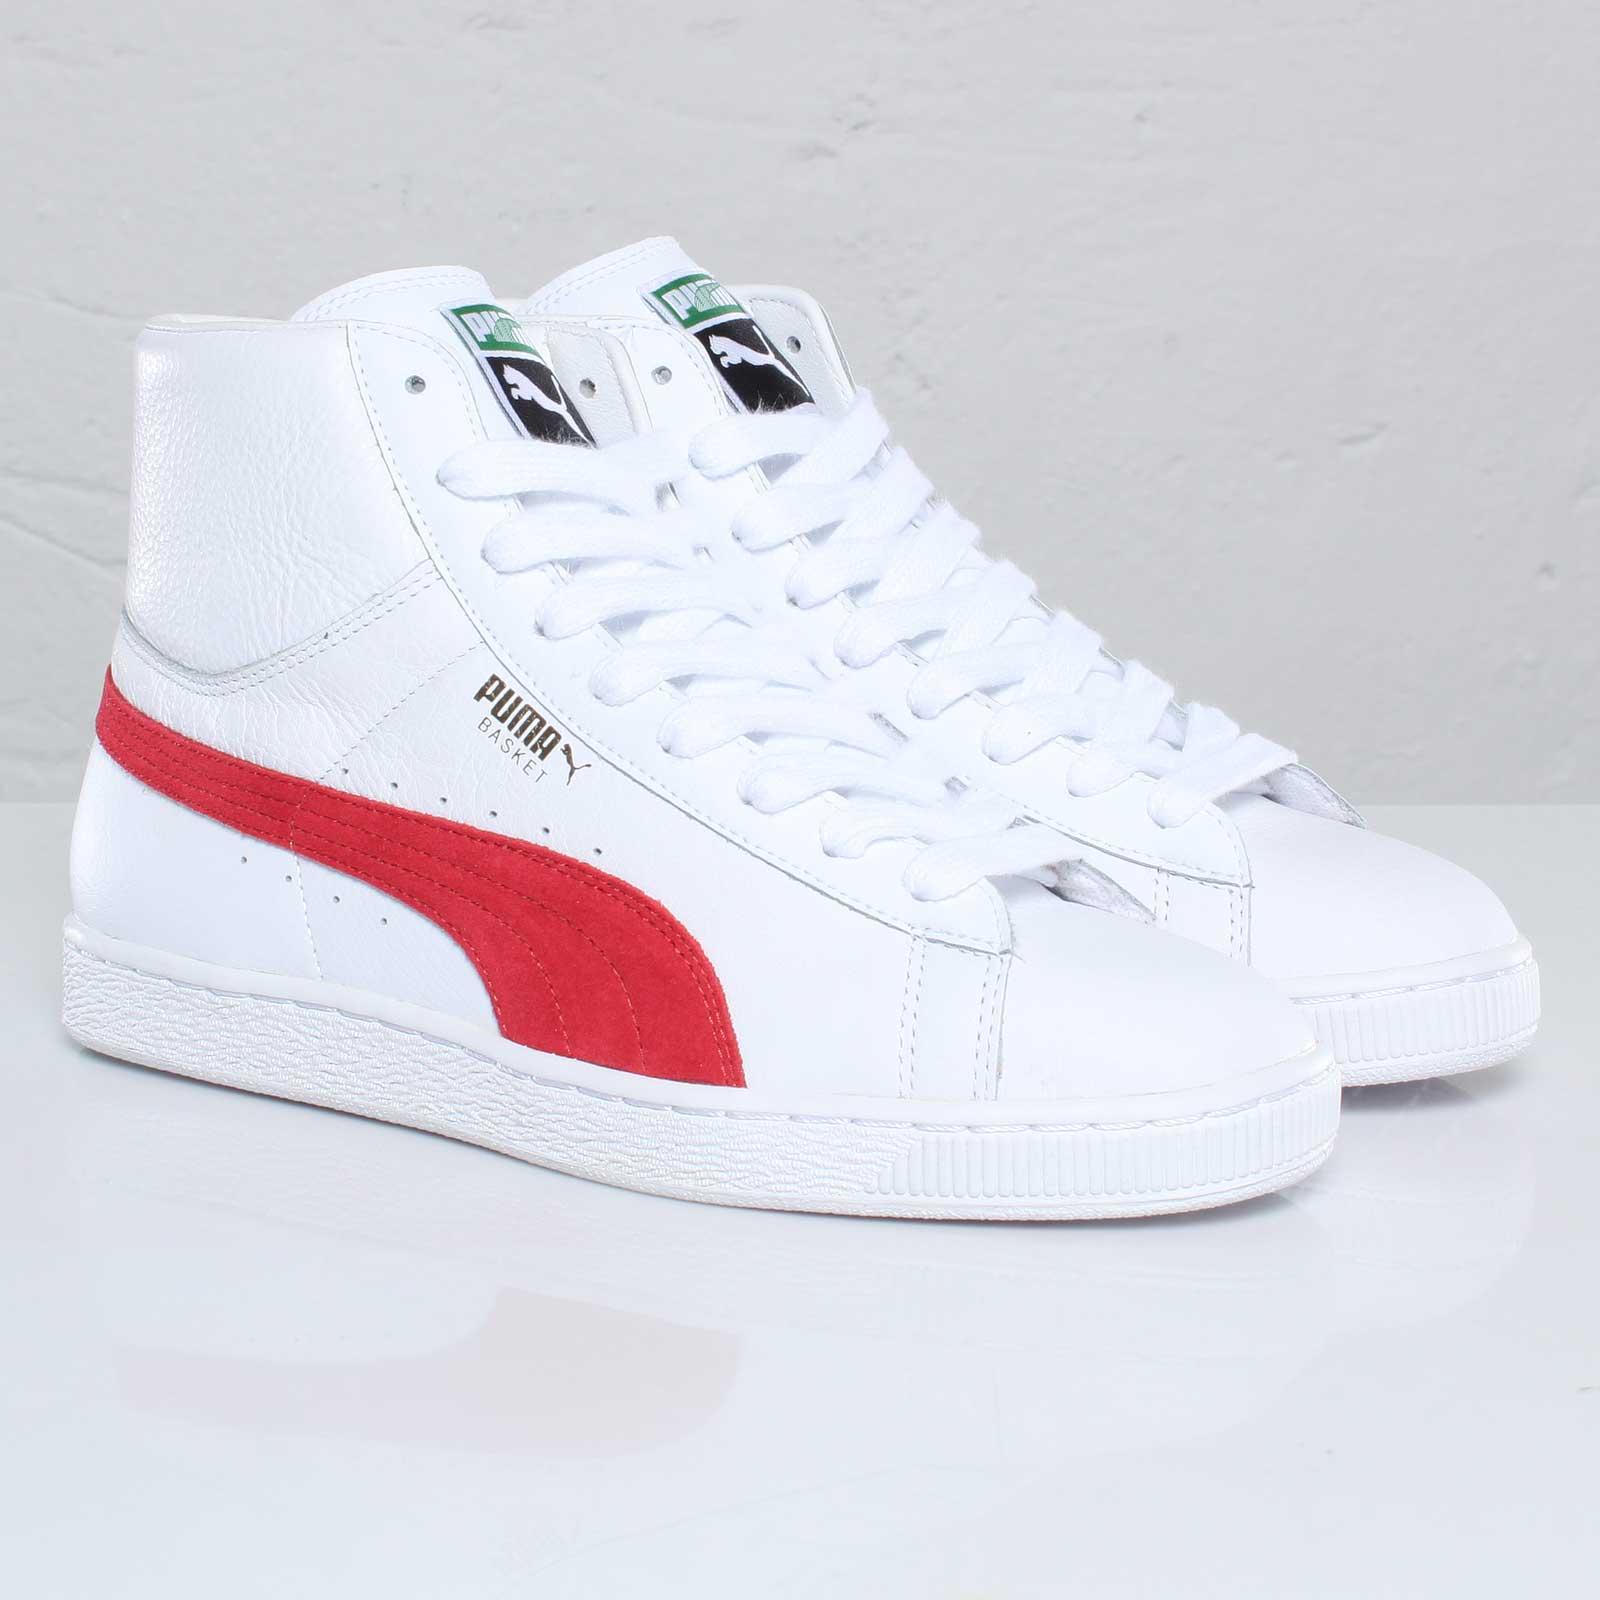 quality design 3c0e7 80a13 Puma Basket Classic Mid L - 109135 - Sneakersnstuff ...